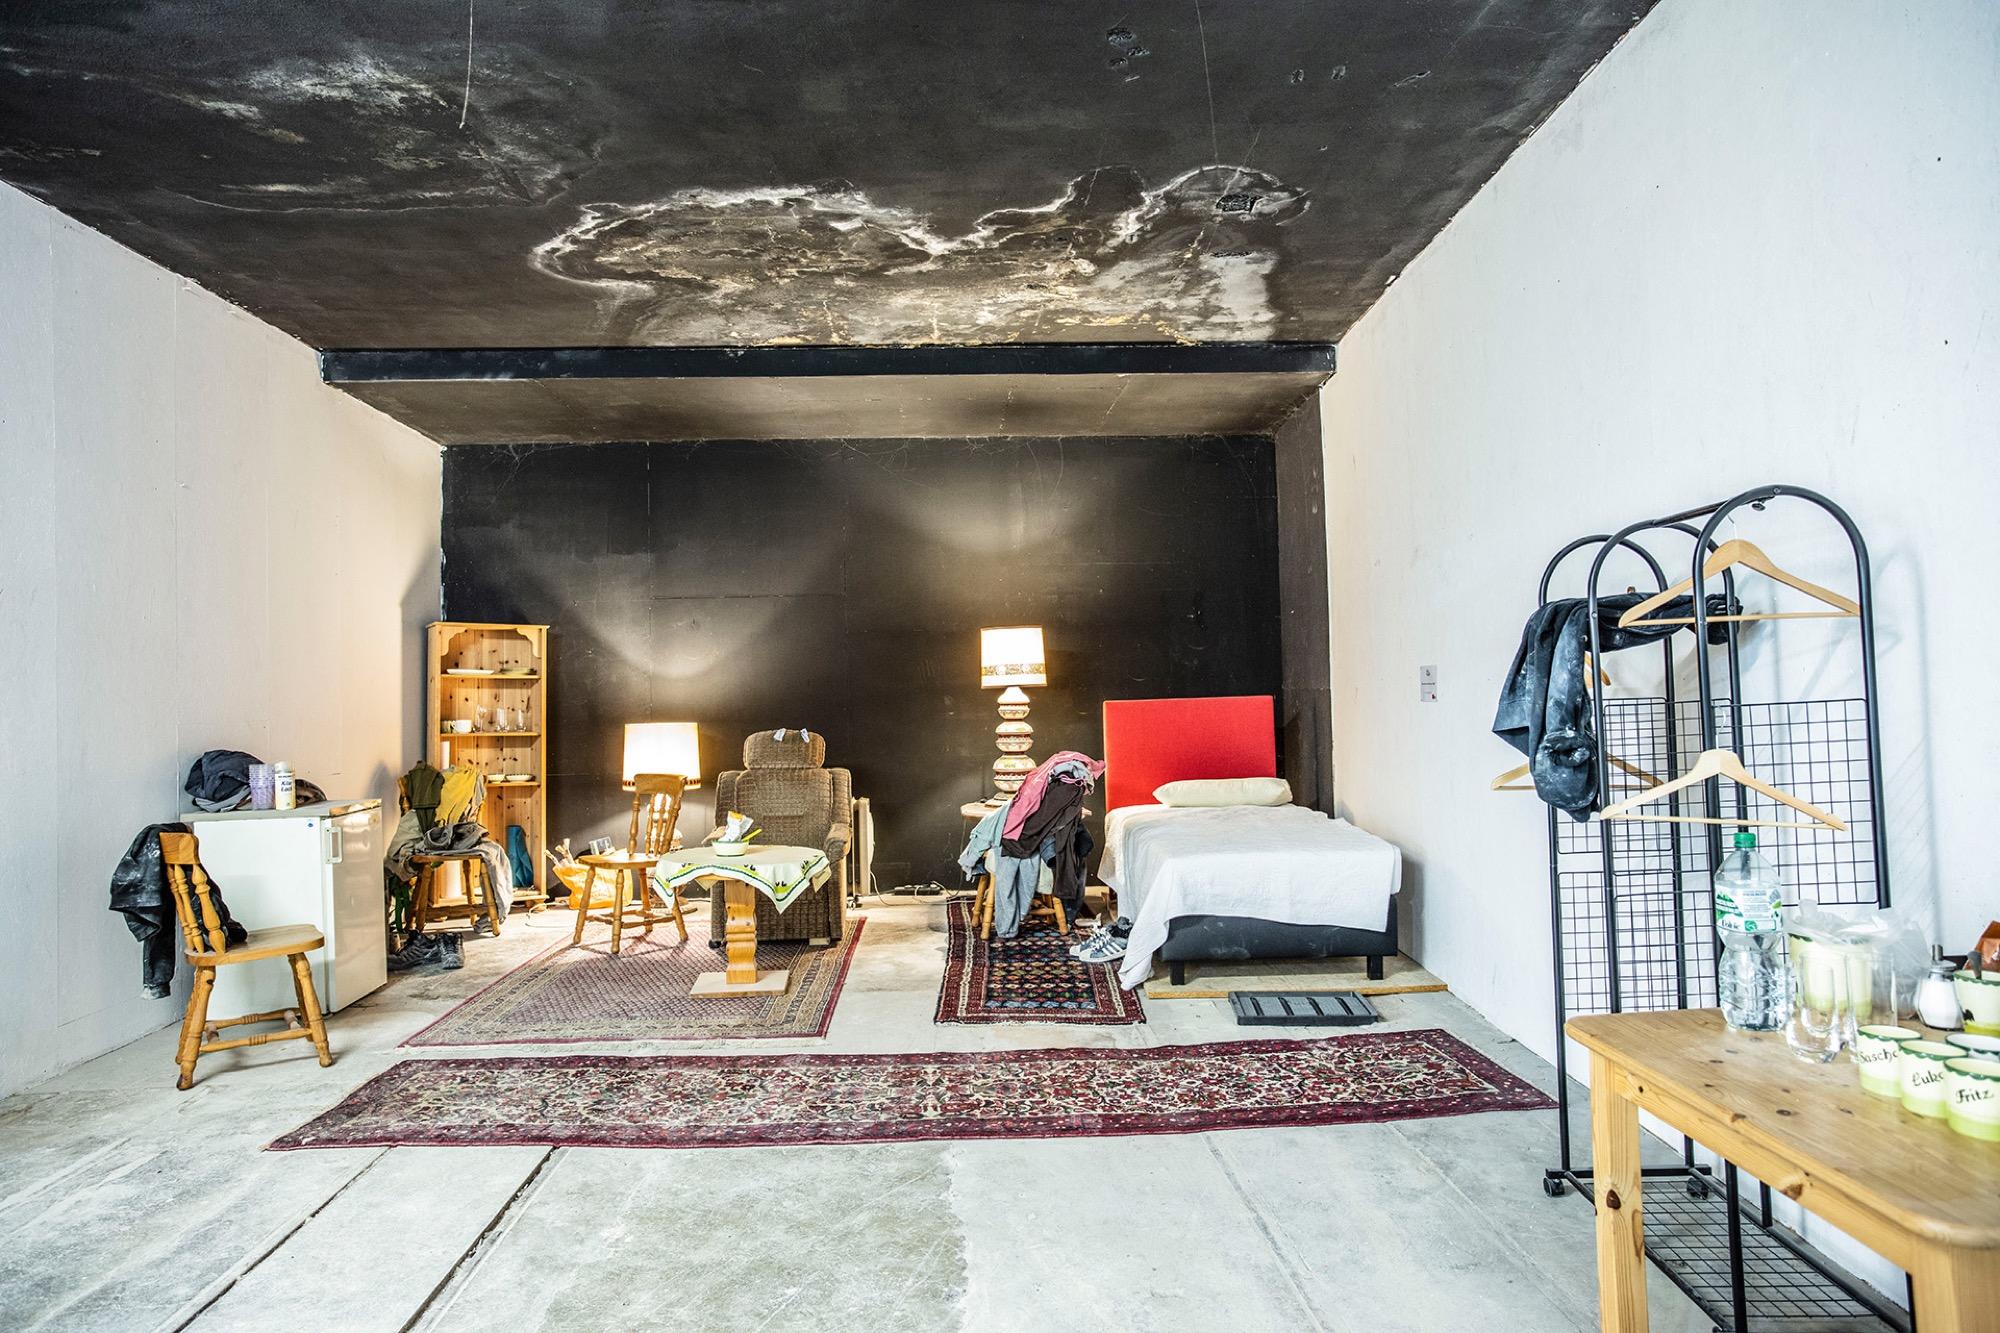 2021-4-23-ZE-Fabry-privat-Markus Lüpertz-20210222_Schwarzwald-Atelier_lowres